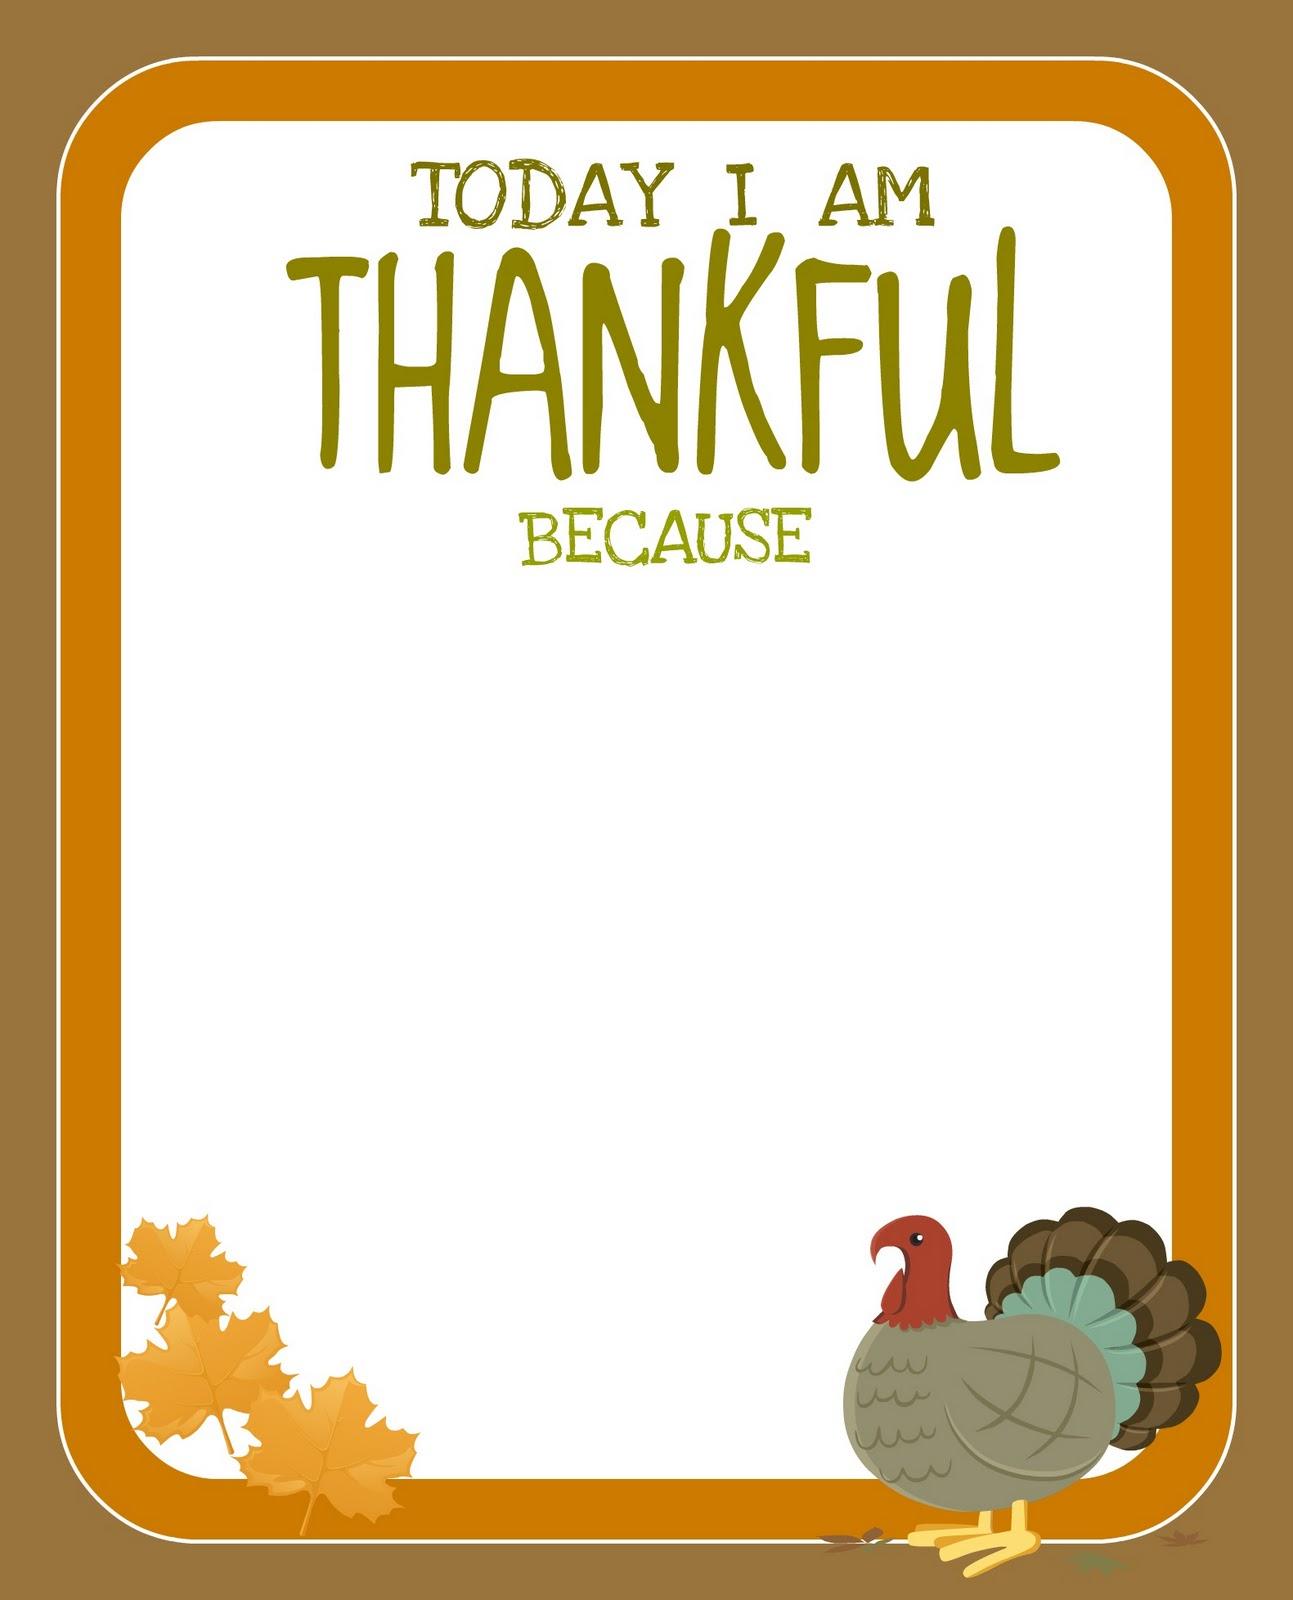 Printable} Free Thanksgiving Printable! - Creative Juice - Free Printable Thanksgiving Images